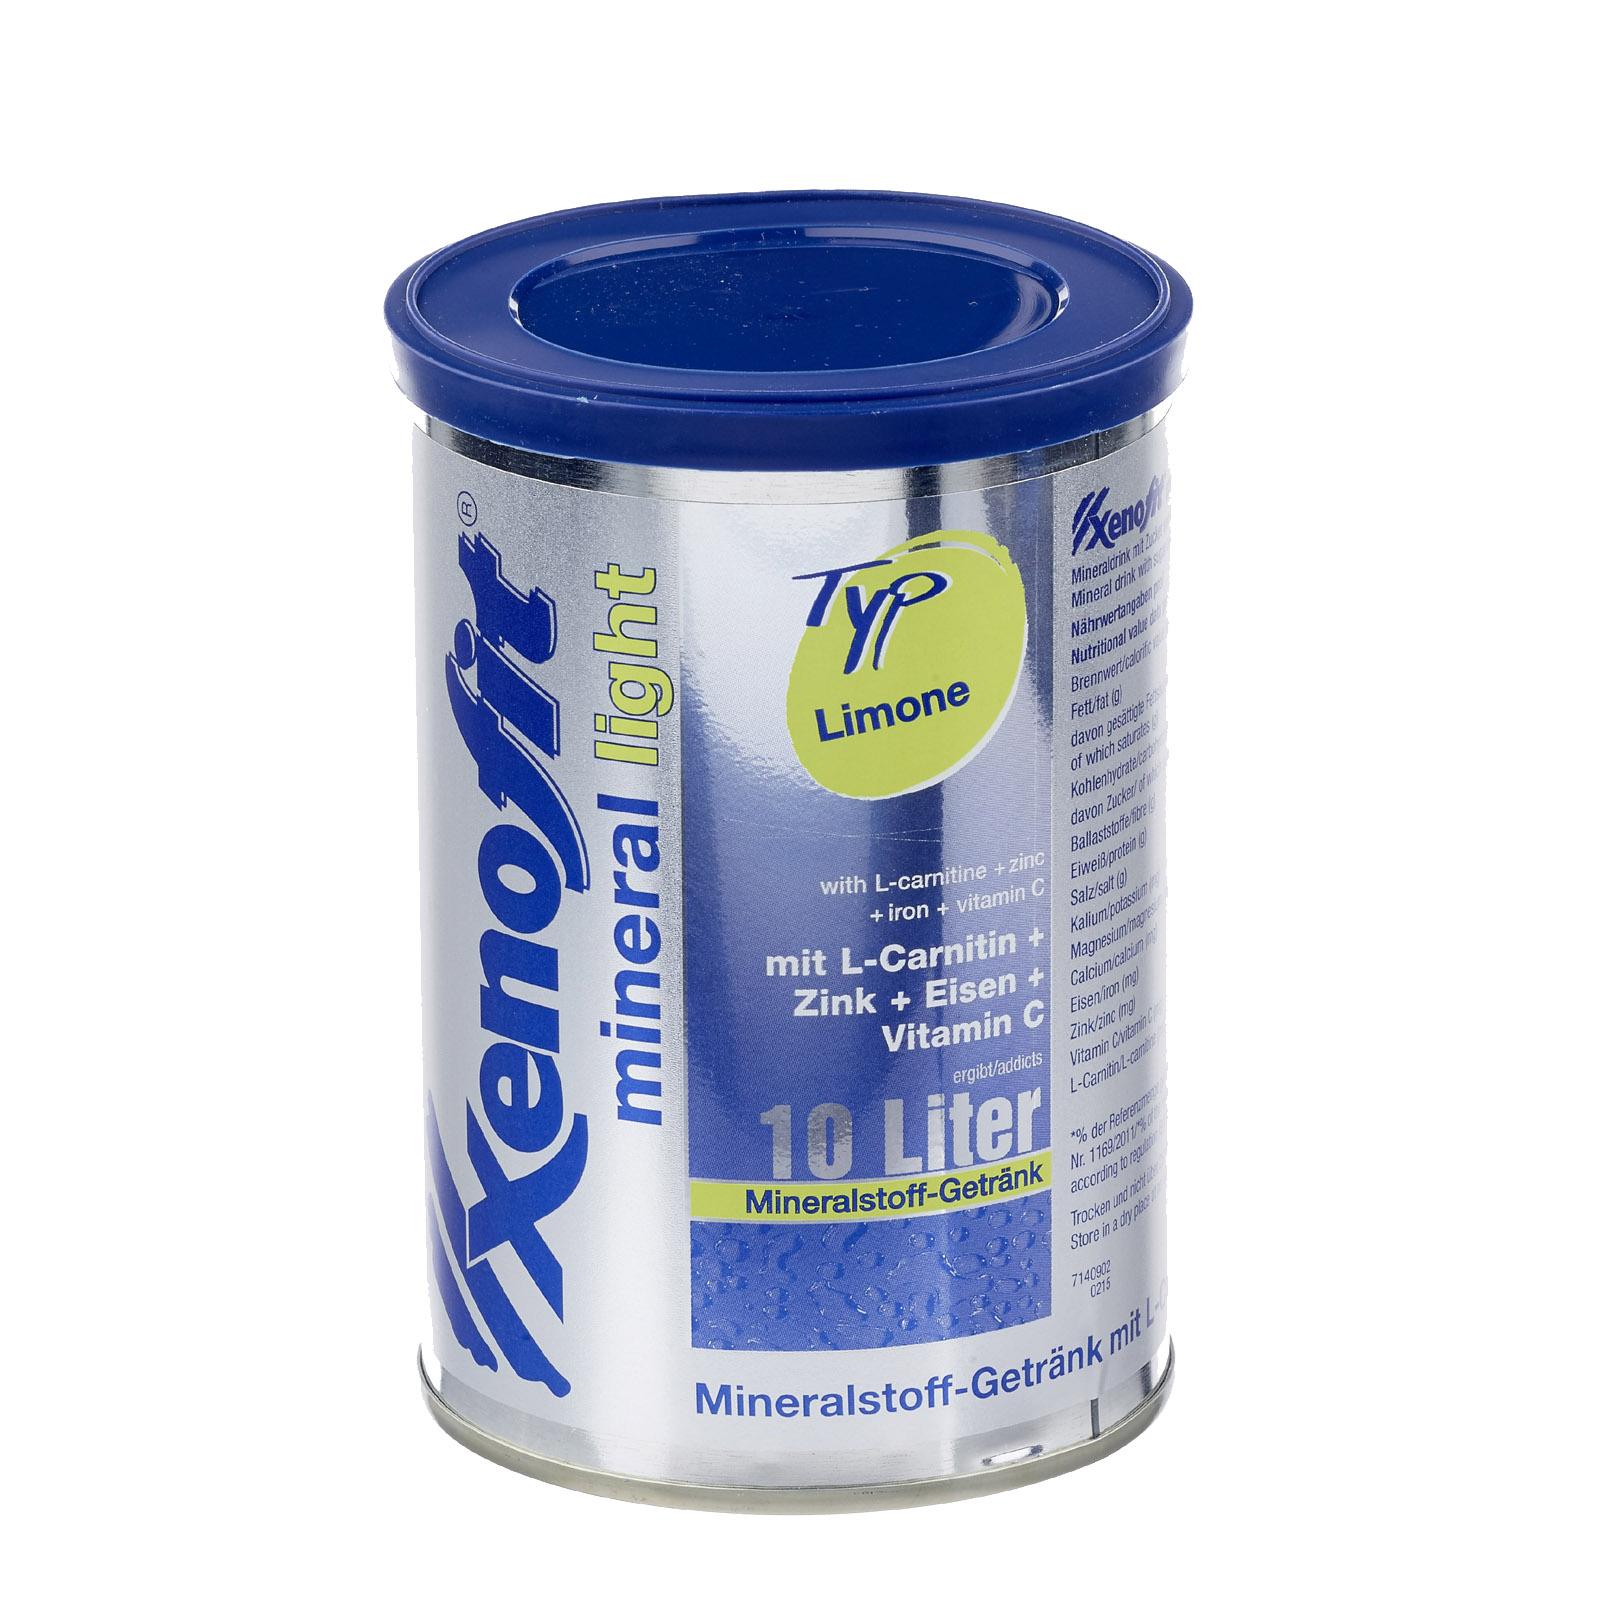 Xenofit mineral light - Mineralgetränk Limone Dose 260g